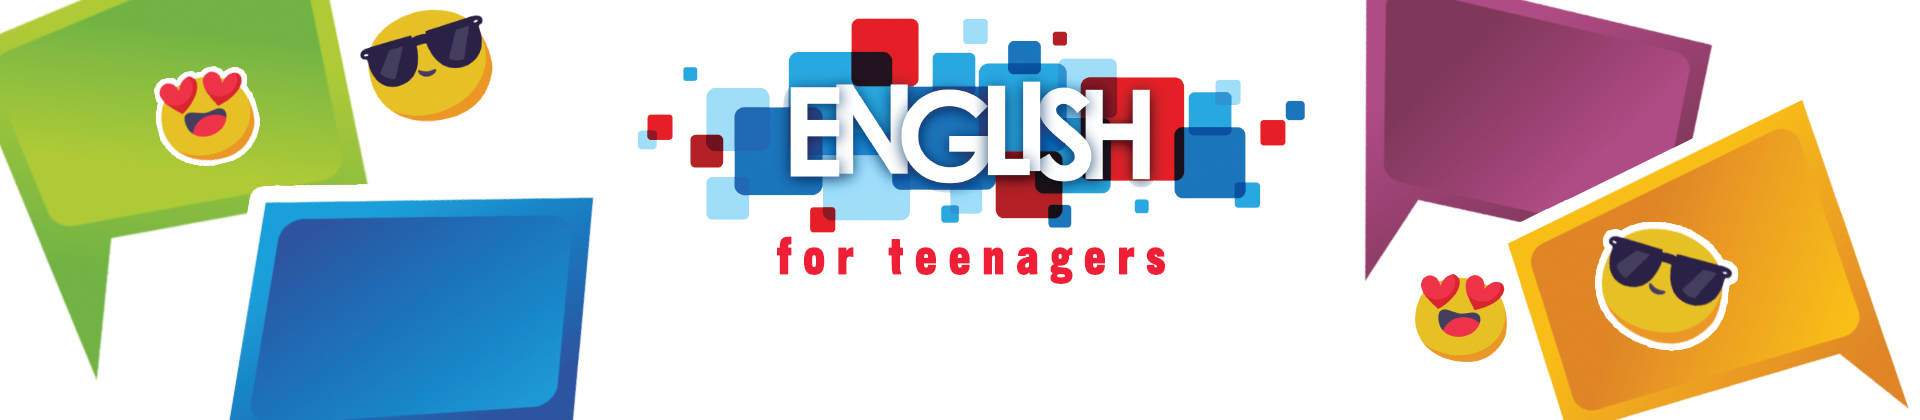 english for teenagers1